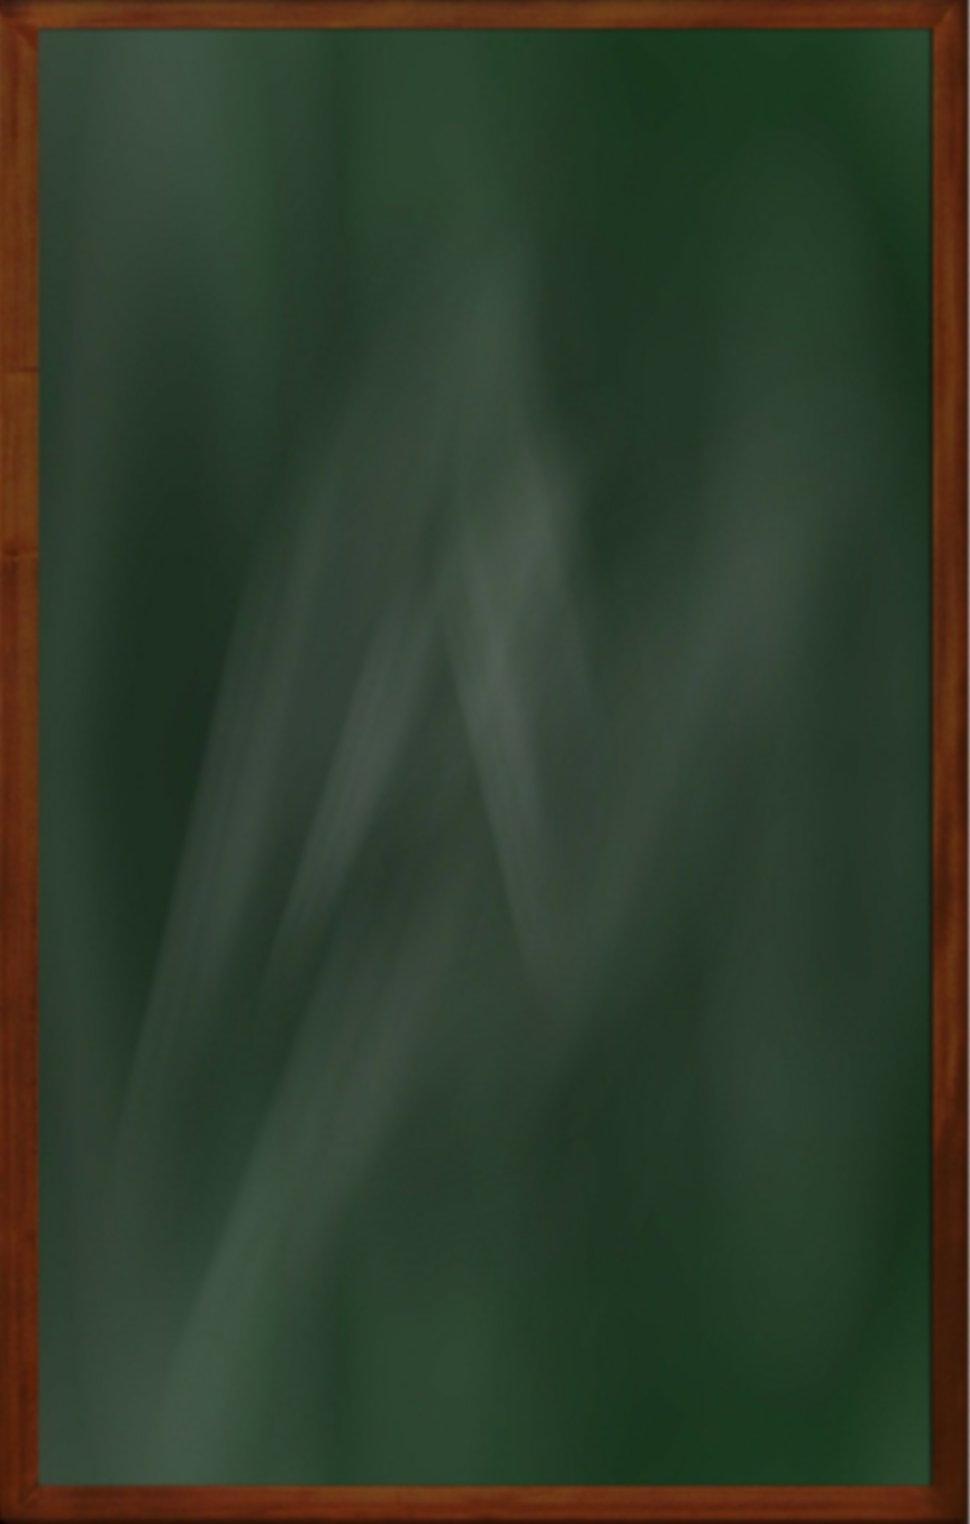 board-64272_1920.jpg